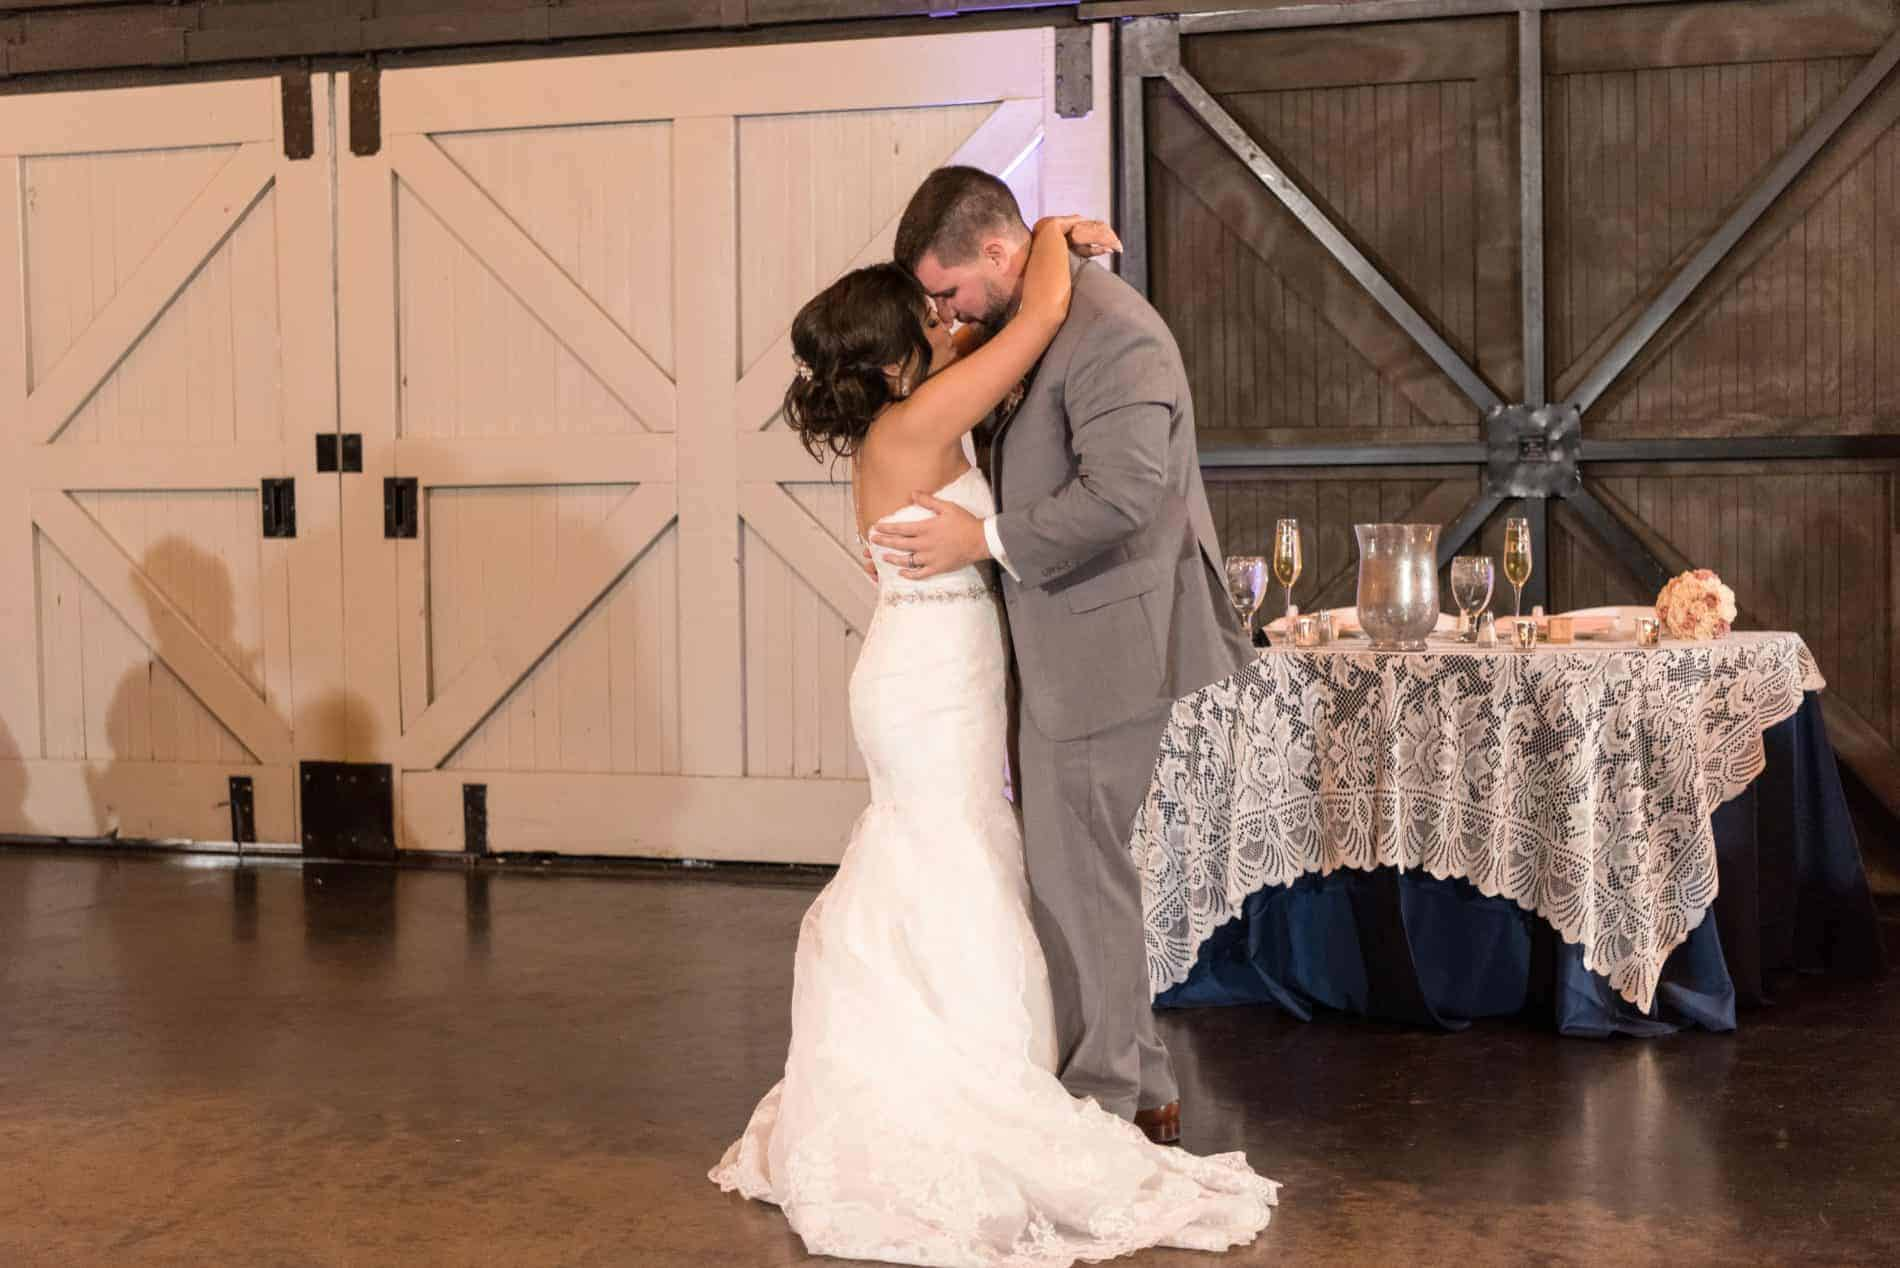 Bride dances at her Rustic Winter Park Wedding